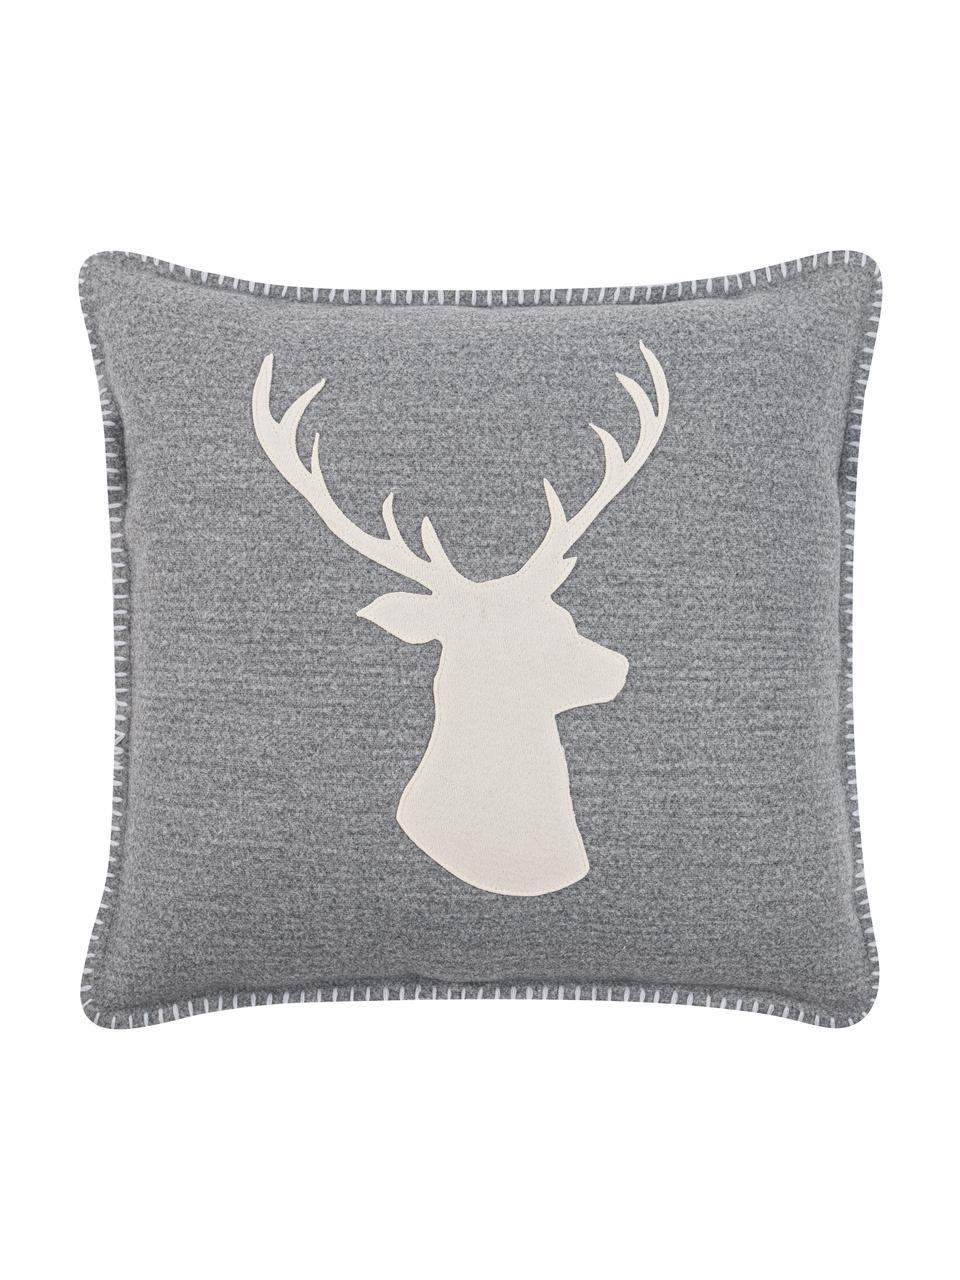 Housse de coussin 45x45 tête de cerf Deer, Gris, blanc